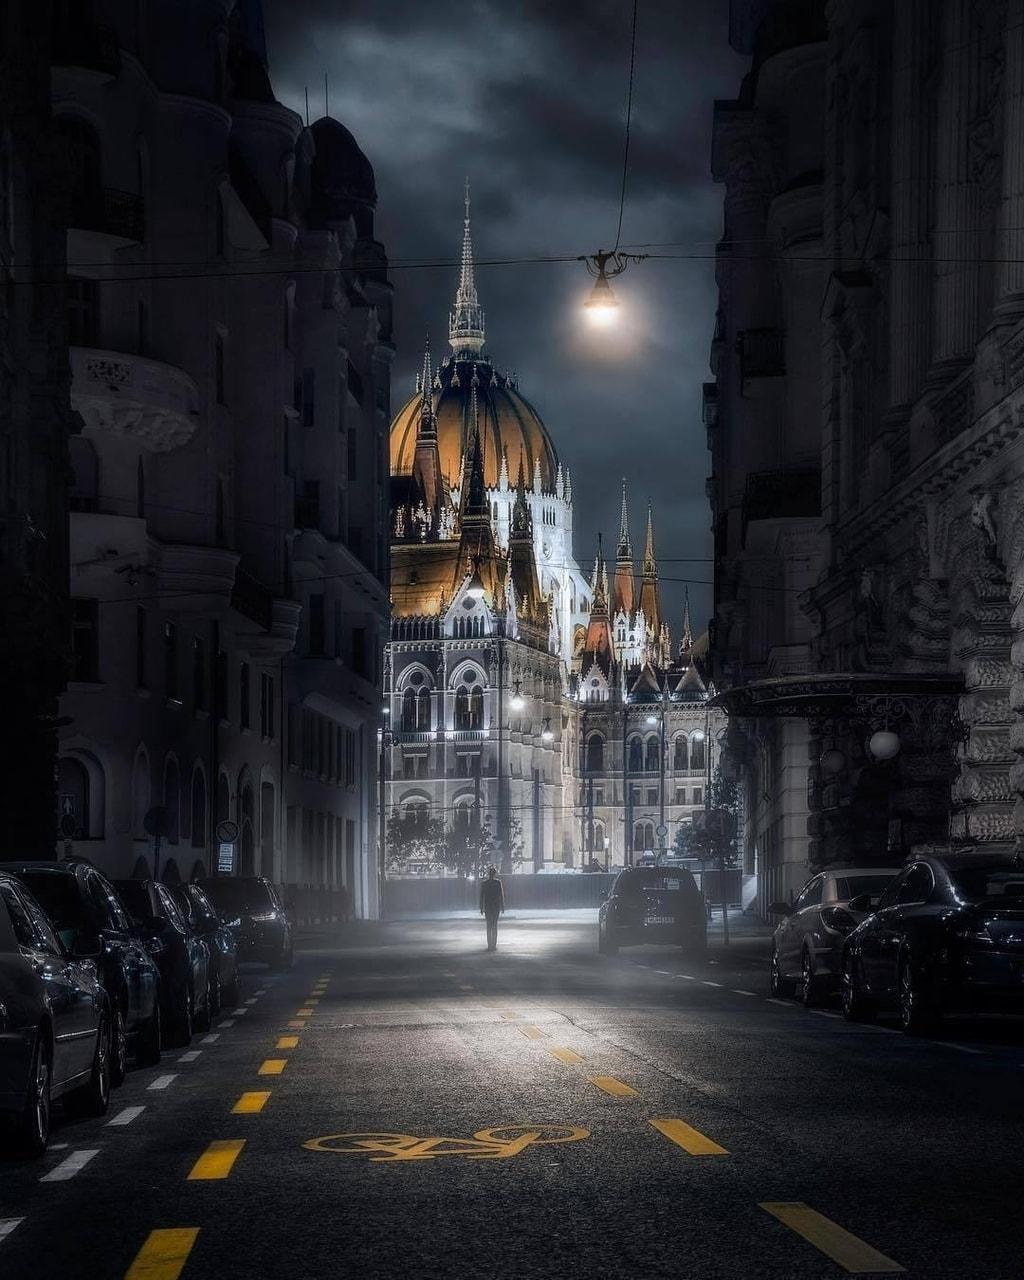 arquitectura, lugares, and nocturno image